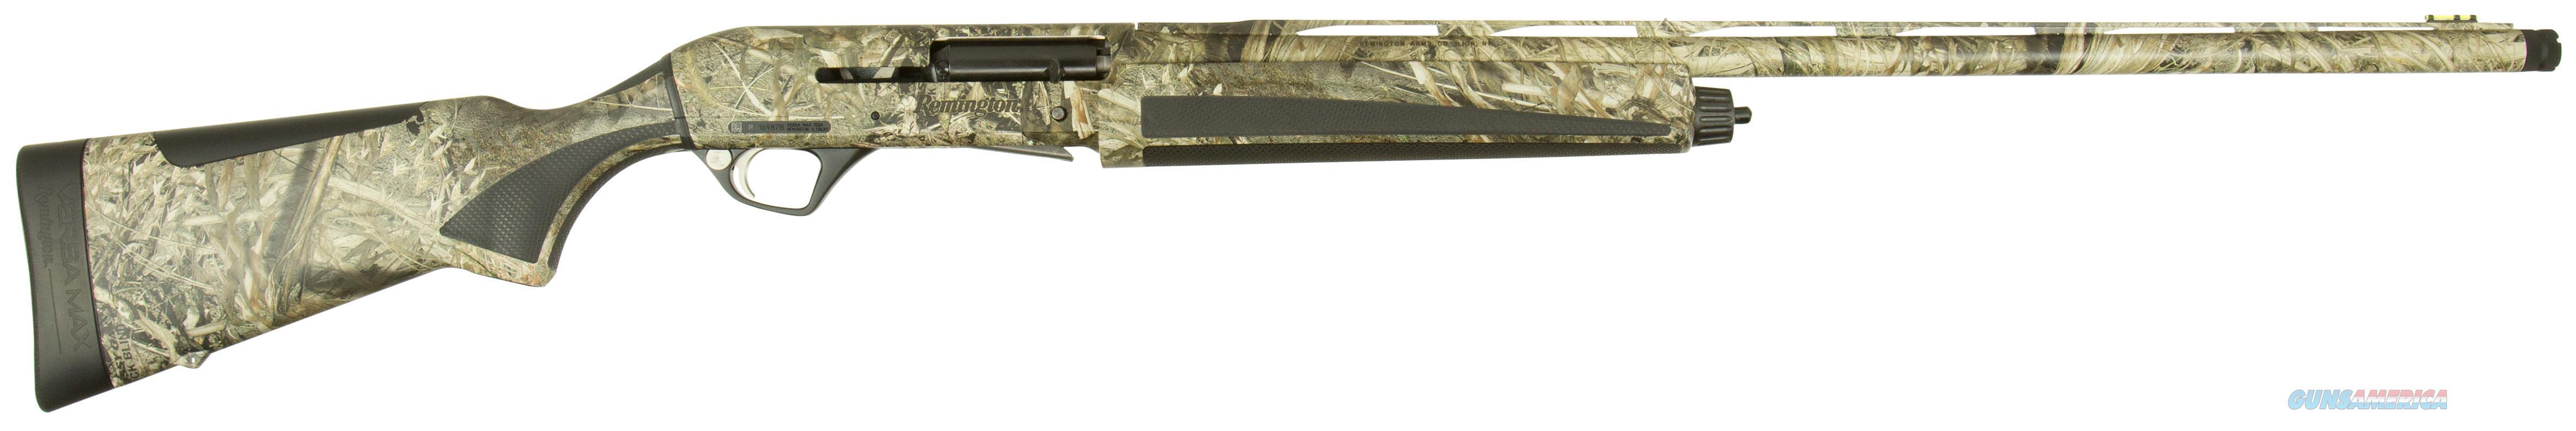 "Remington Firearms 83506 Versa Max Waterfowl Semi-Automatic 12 Gauge 28"" 3.5"" Mossy Oak Duck Blind Synthetic Stk Mossy Oak Duck Blind Aluminum Alloy 83506  Guns > Shotguns > R Misc Shotguns"